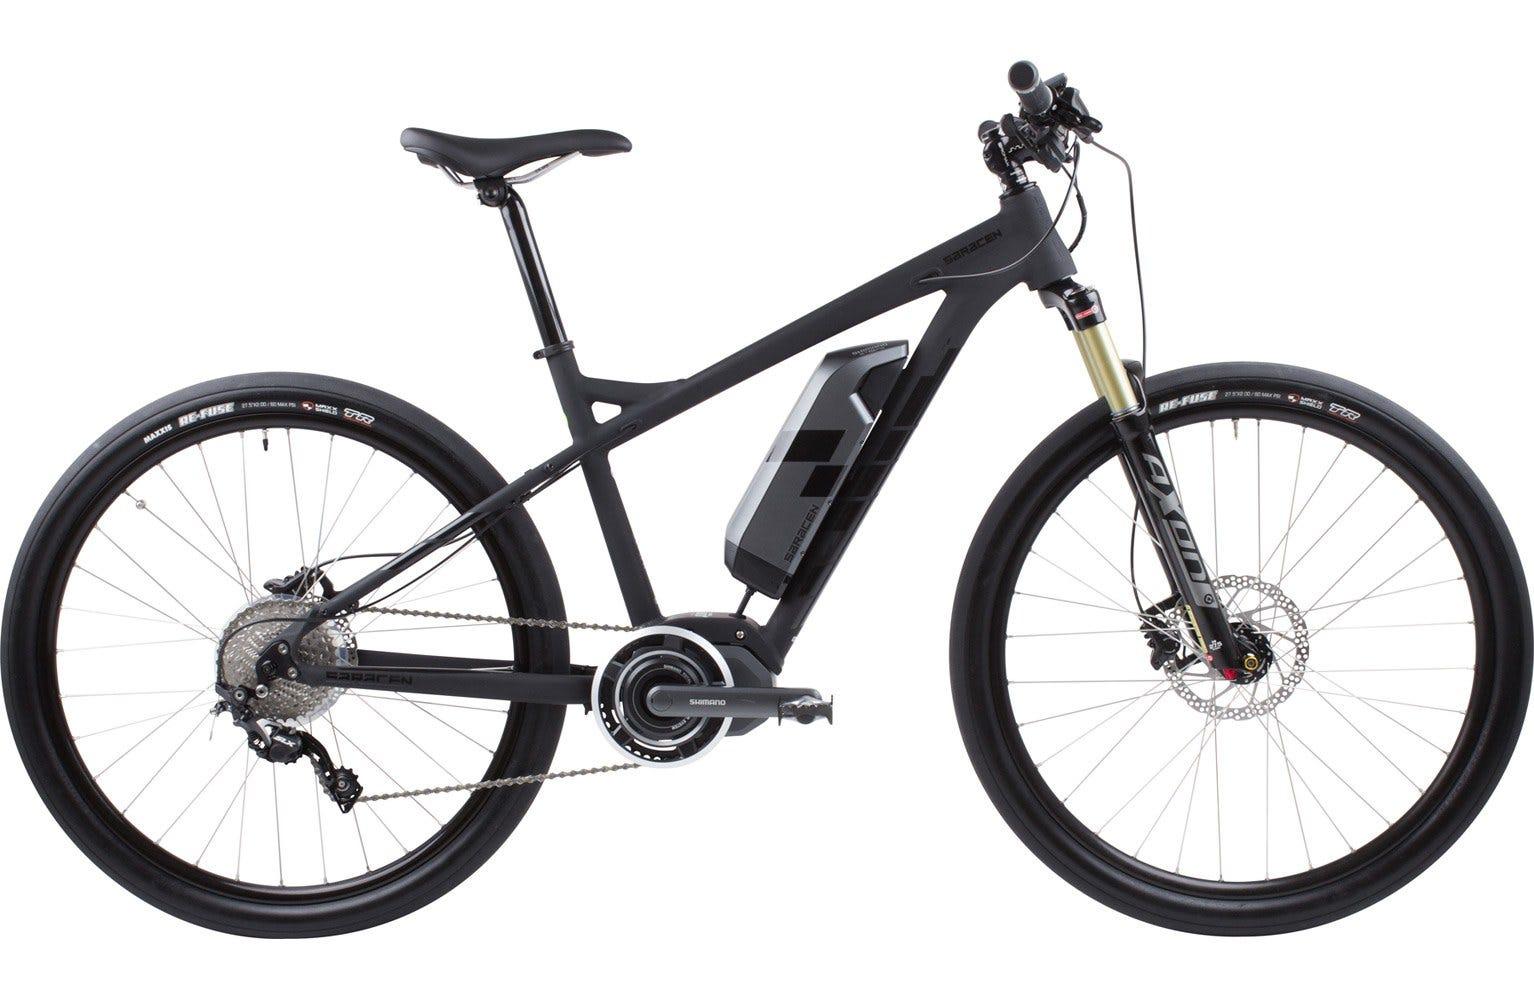 Saracen Juiced 17 inch bike EX DISPLAY